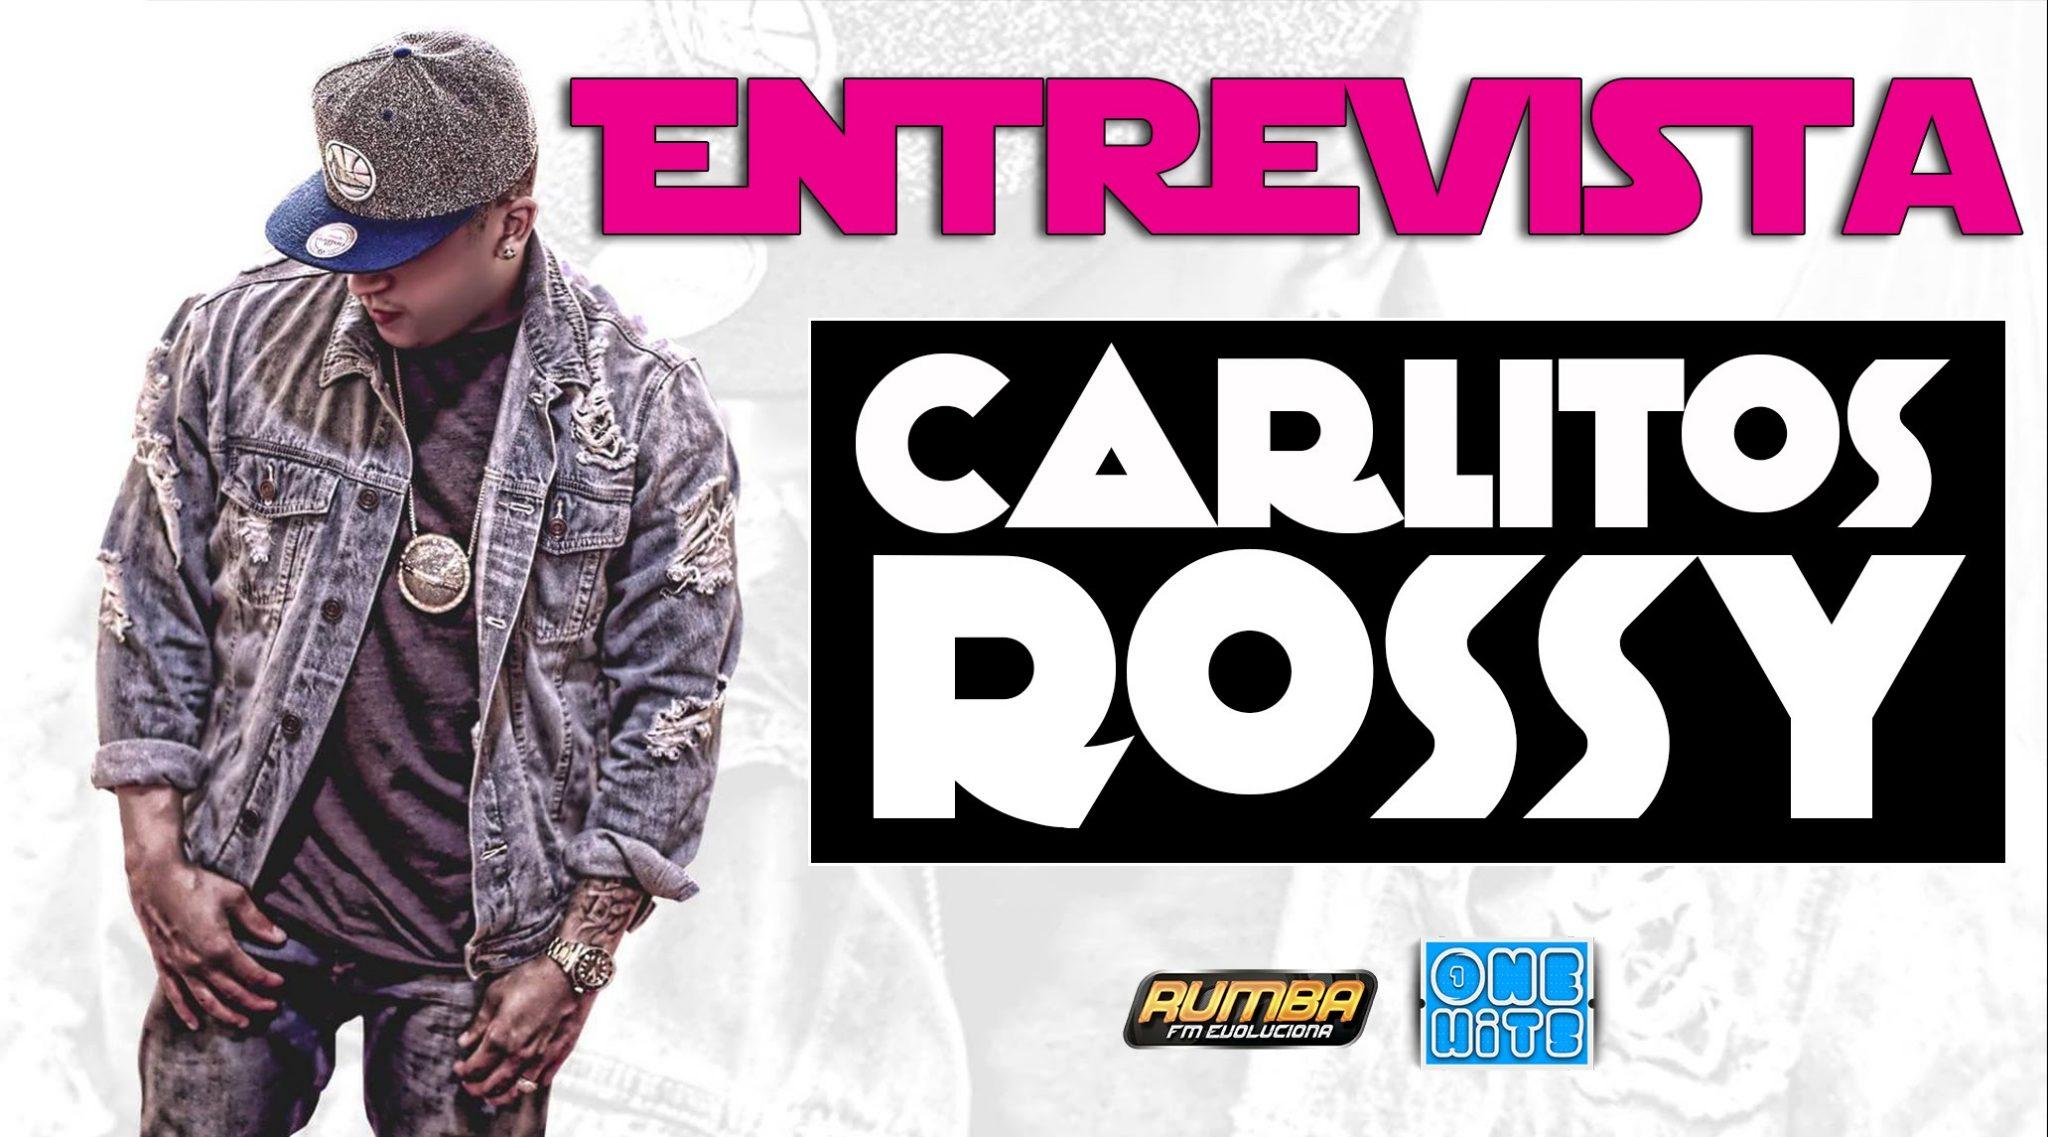 Carlitos Rossy – Onehits TV (Entrevista 2016)